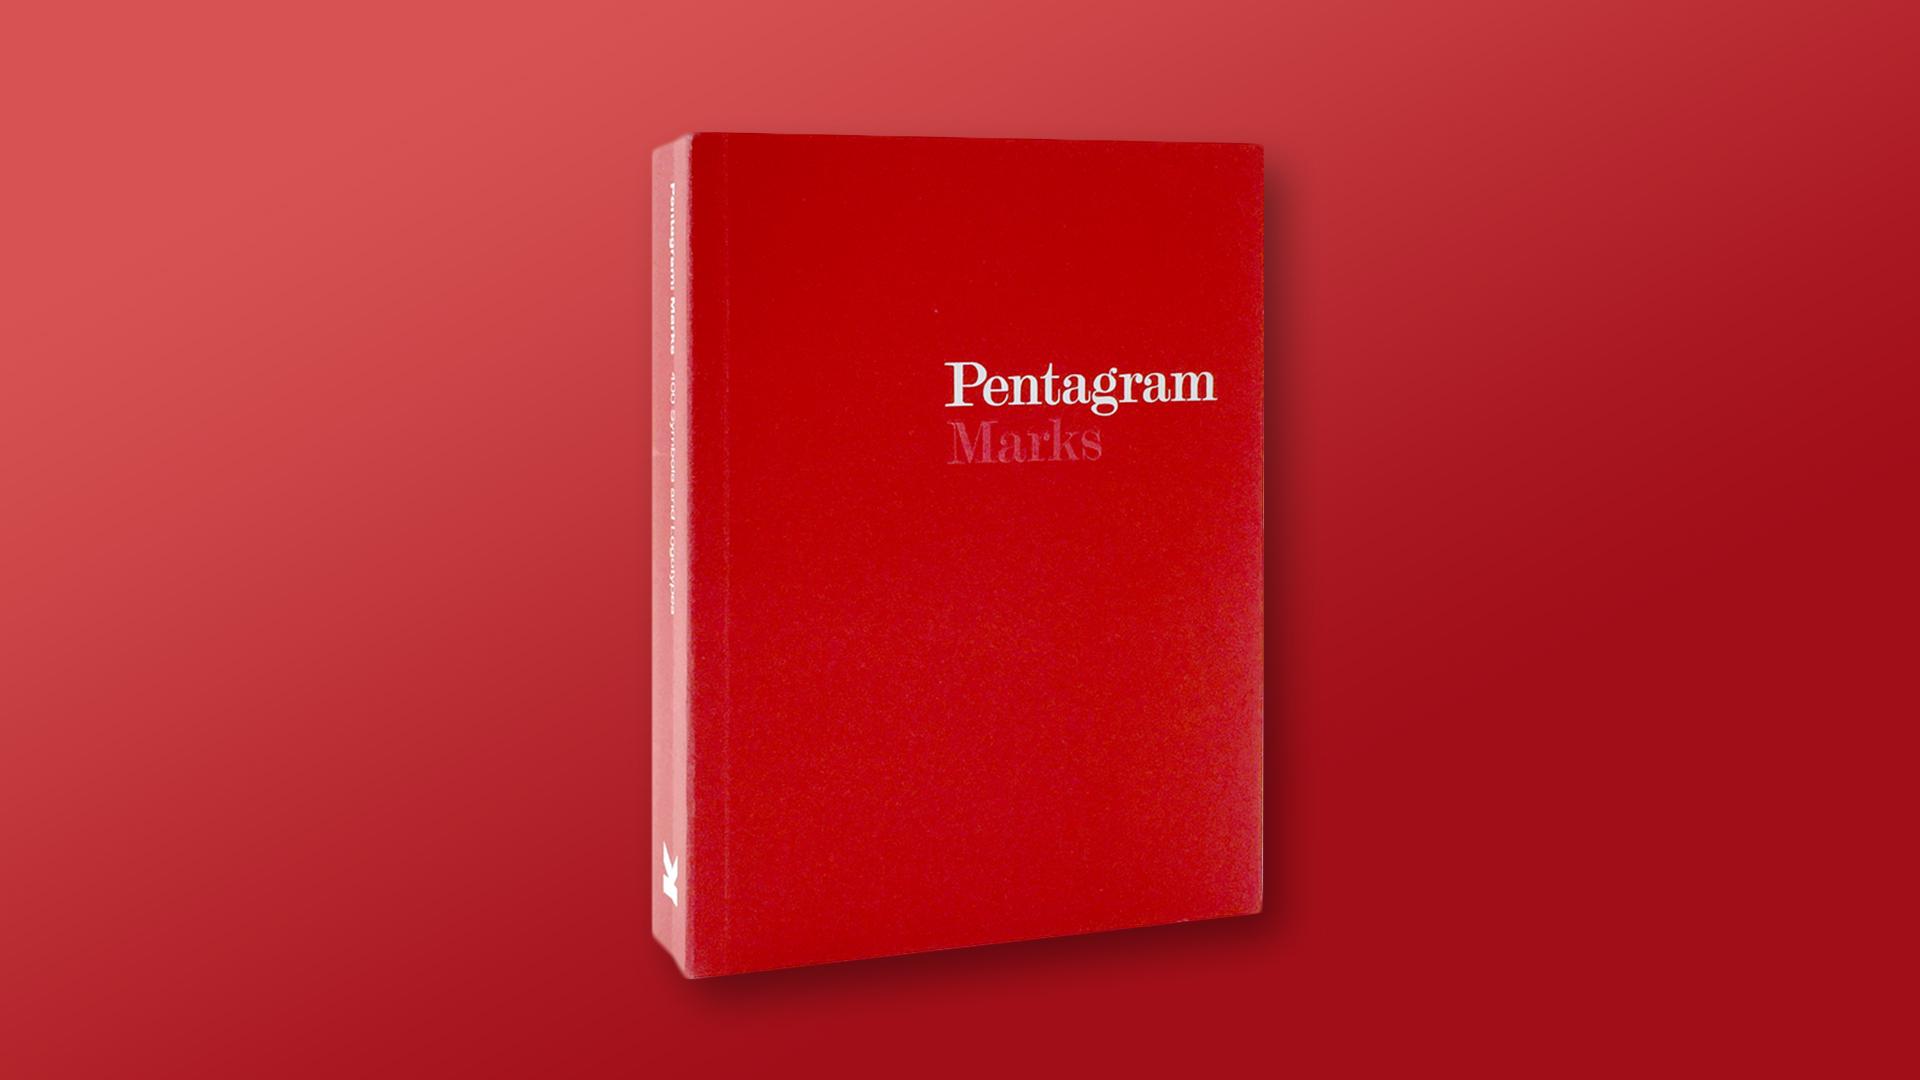 Pentagram Marks Graphic Logo Design Book